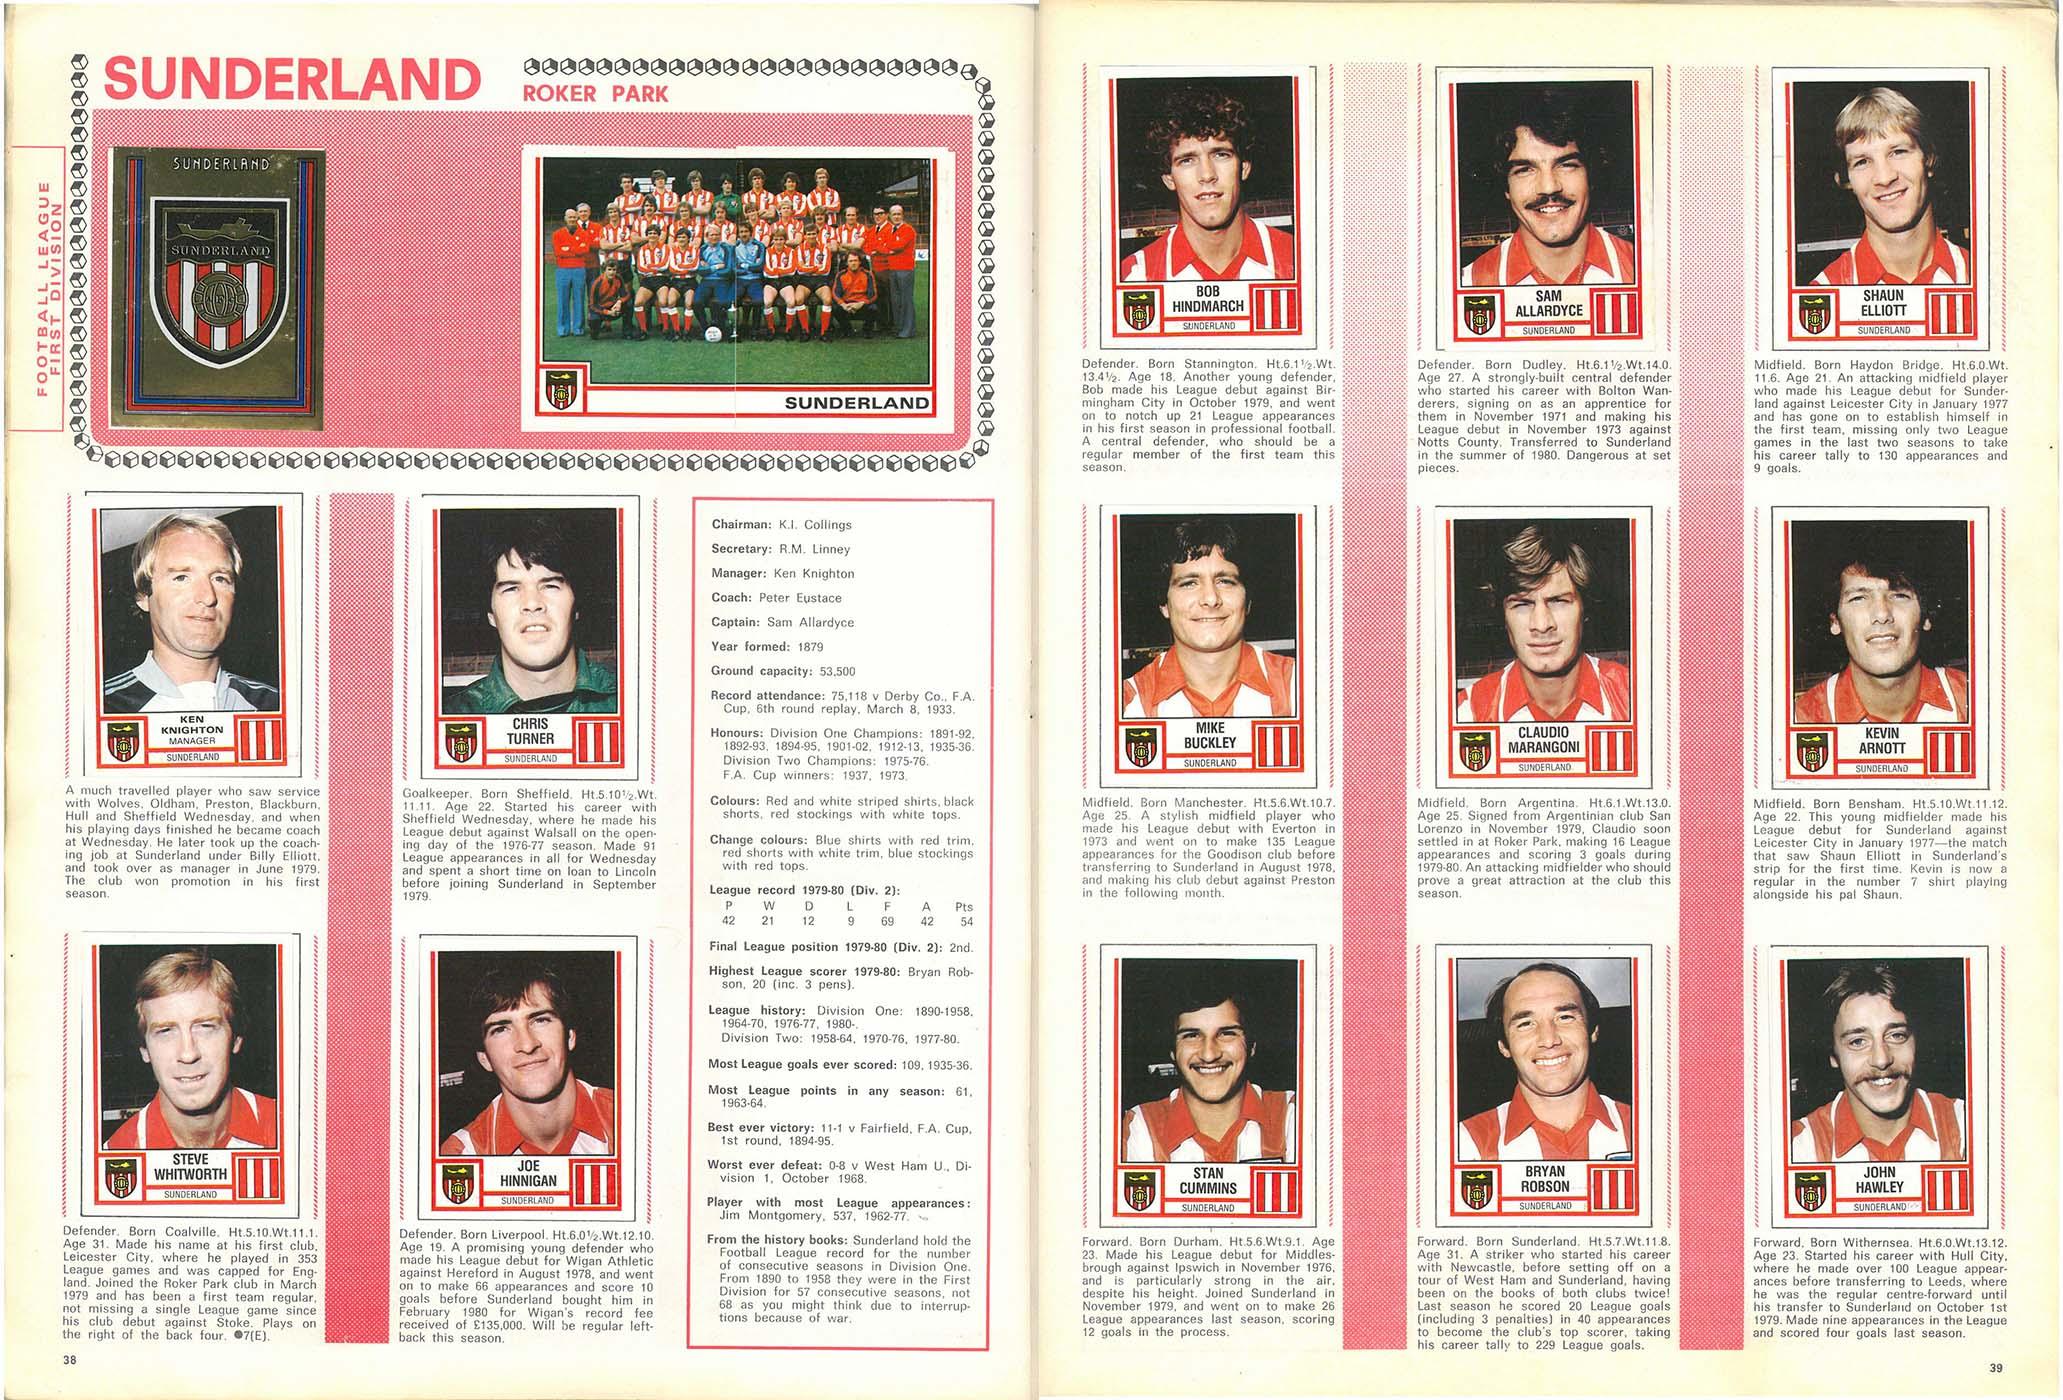 Sunderland 1981